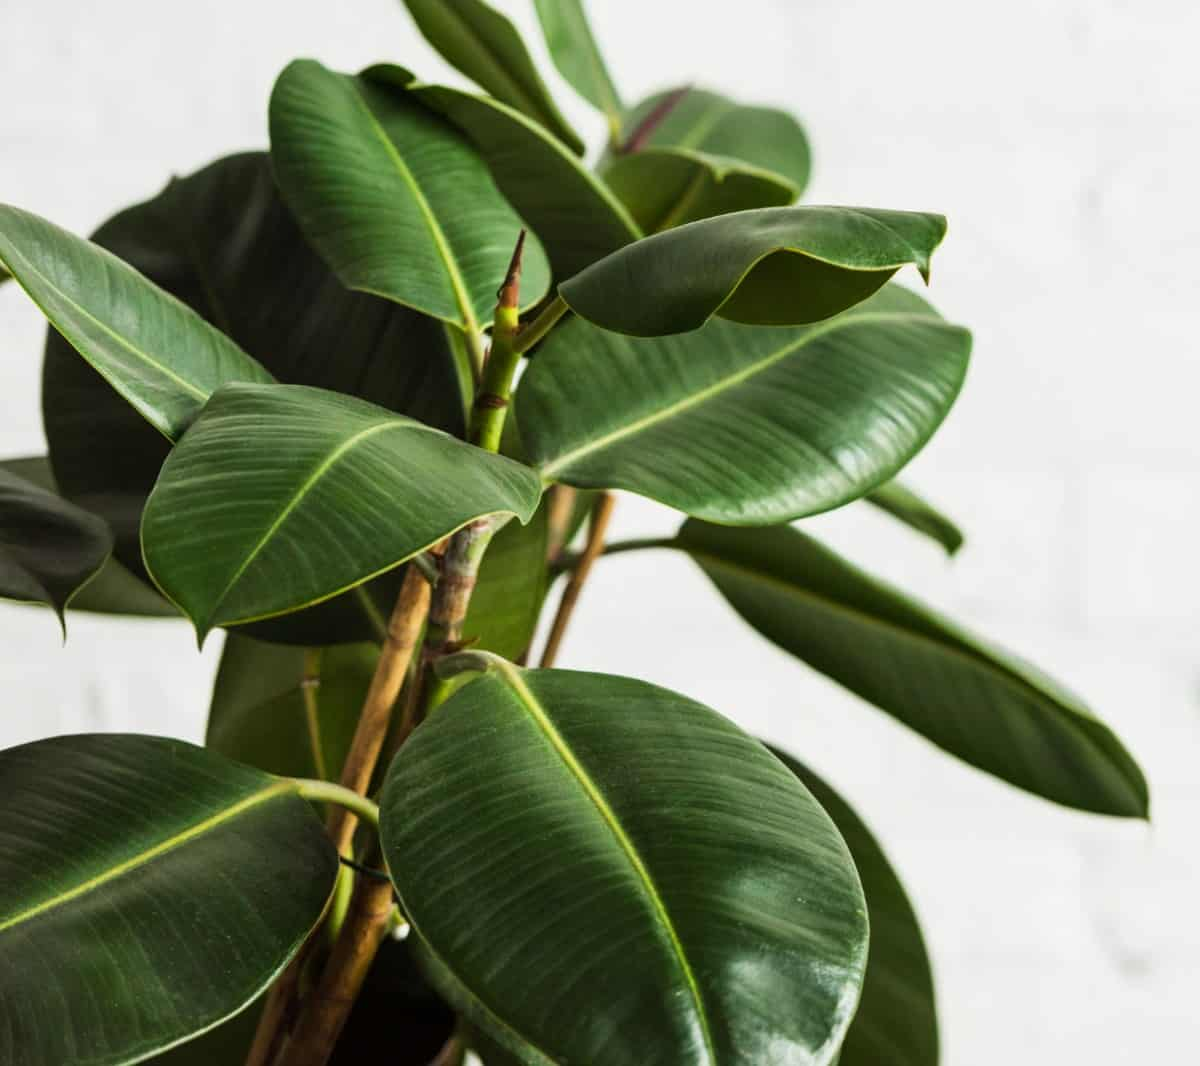 Rubber plants prefer bright light.